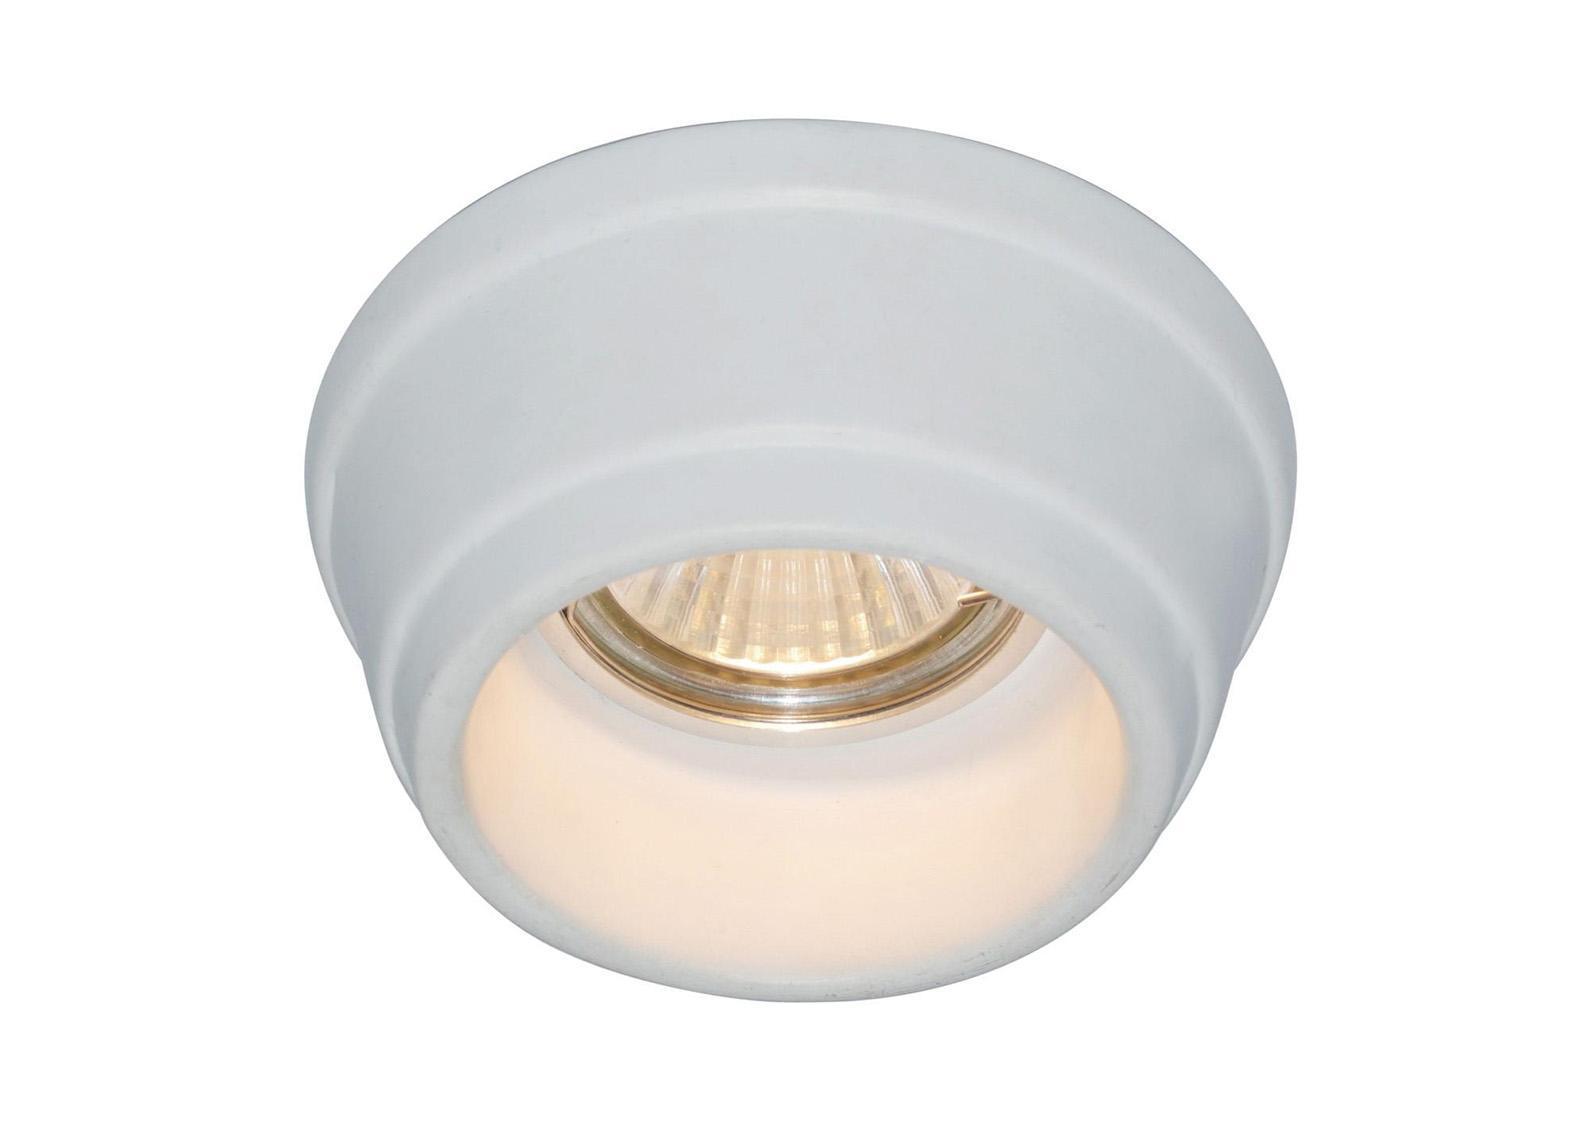 A5243PL-1WH CRATERE Встраиваемый светильникA5243PL-1WH1x50W; патроны GU10 и G5,3 в комплекте Материал: Арматура: КерамикаРазмер: 104x104x60Цвет: Белый